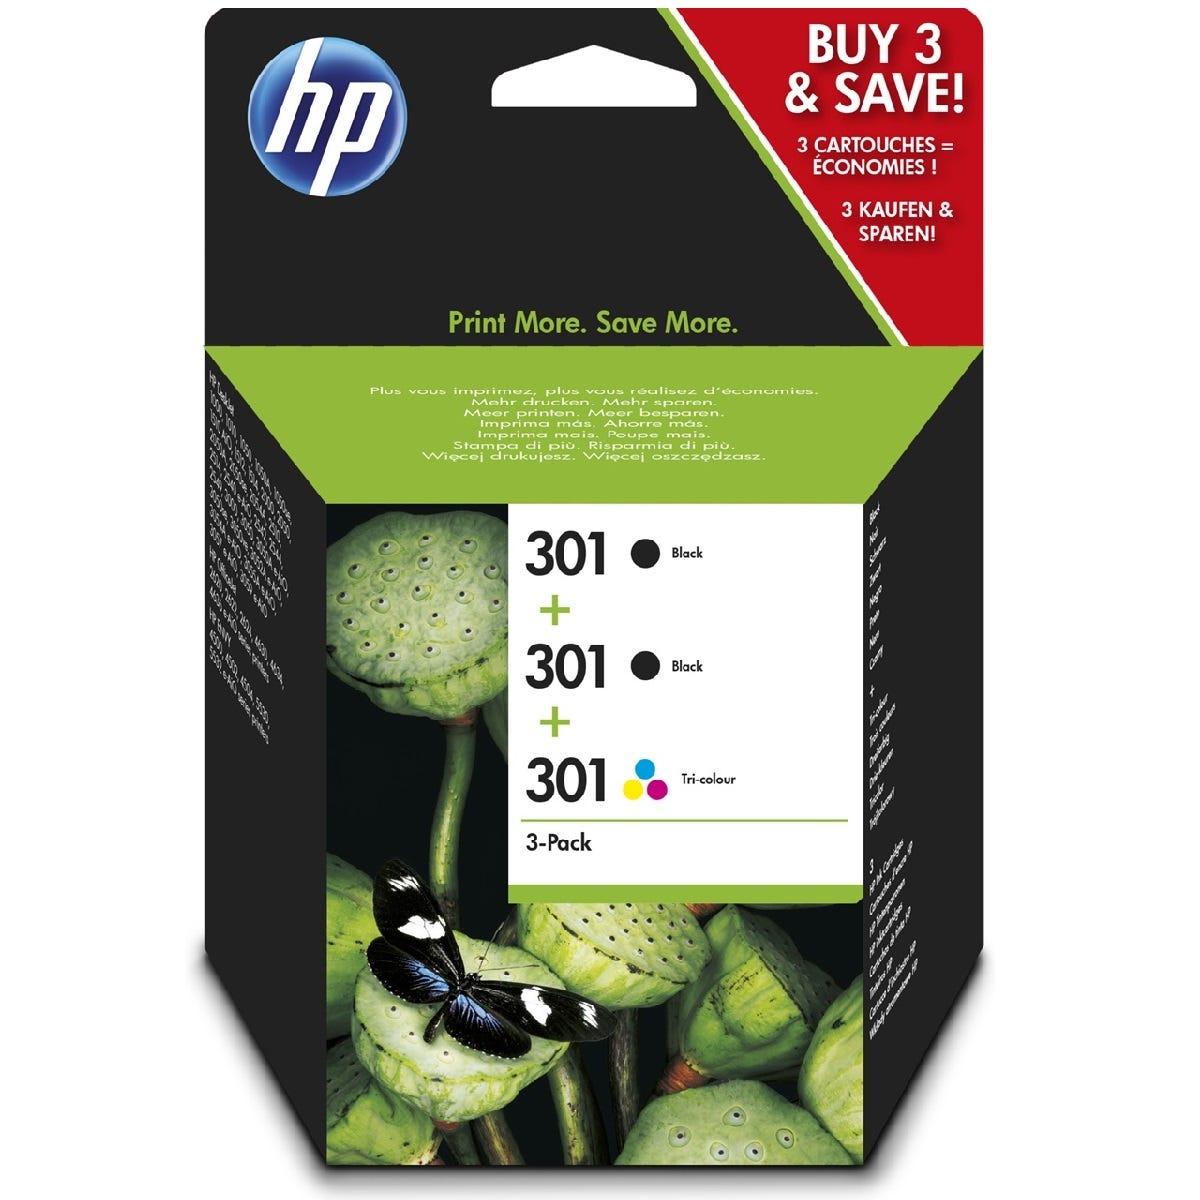 HP 301 Black(2)/Tri-colour(1) 3-pack Original Ink Cartridges